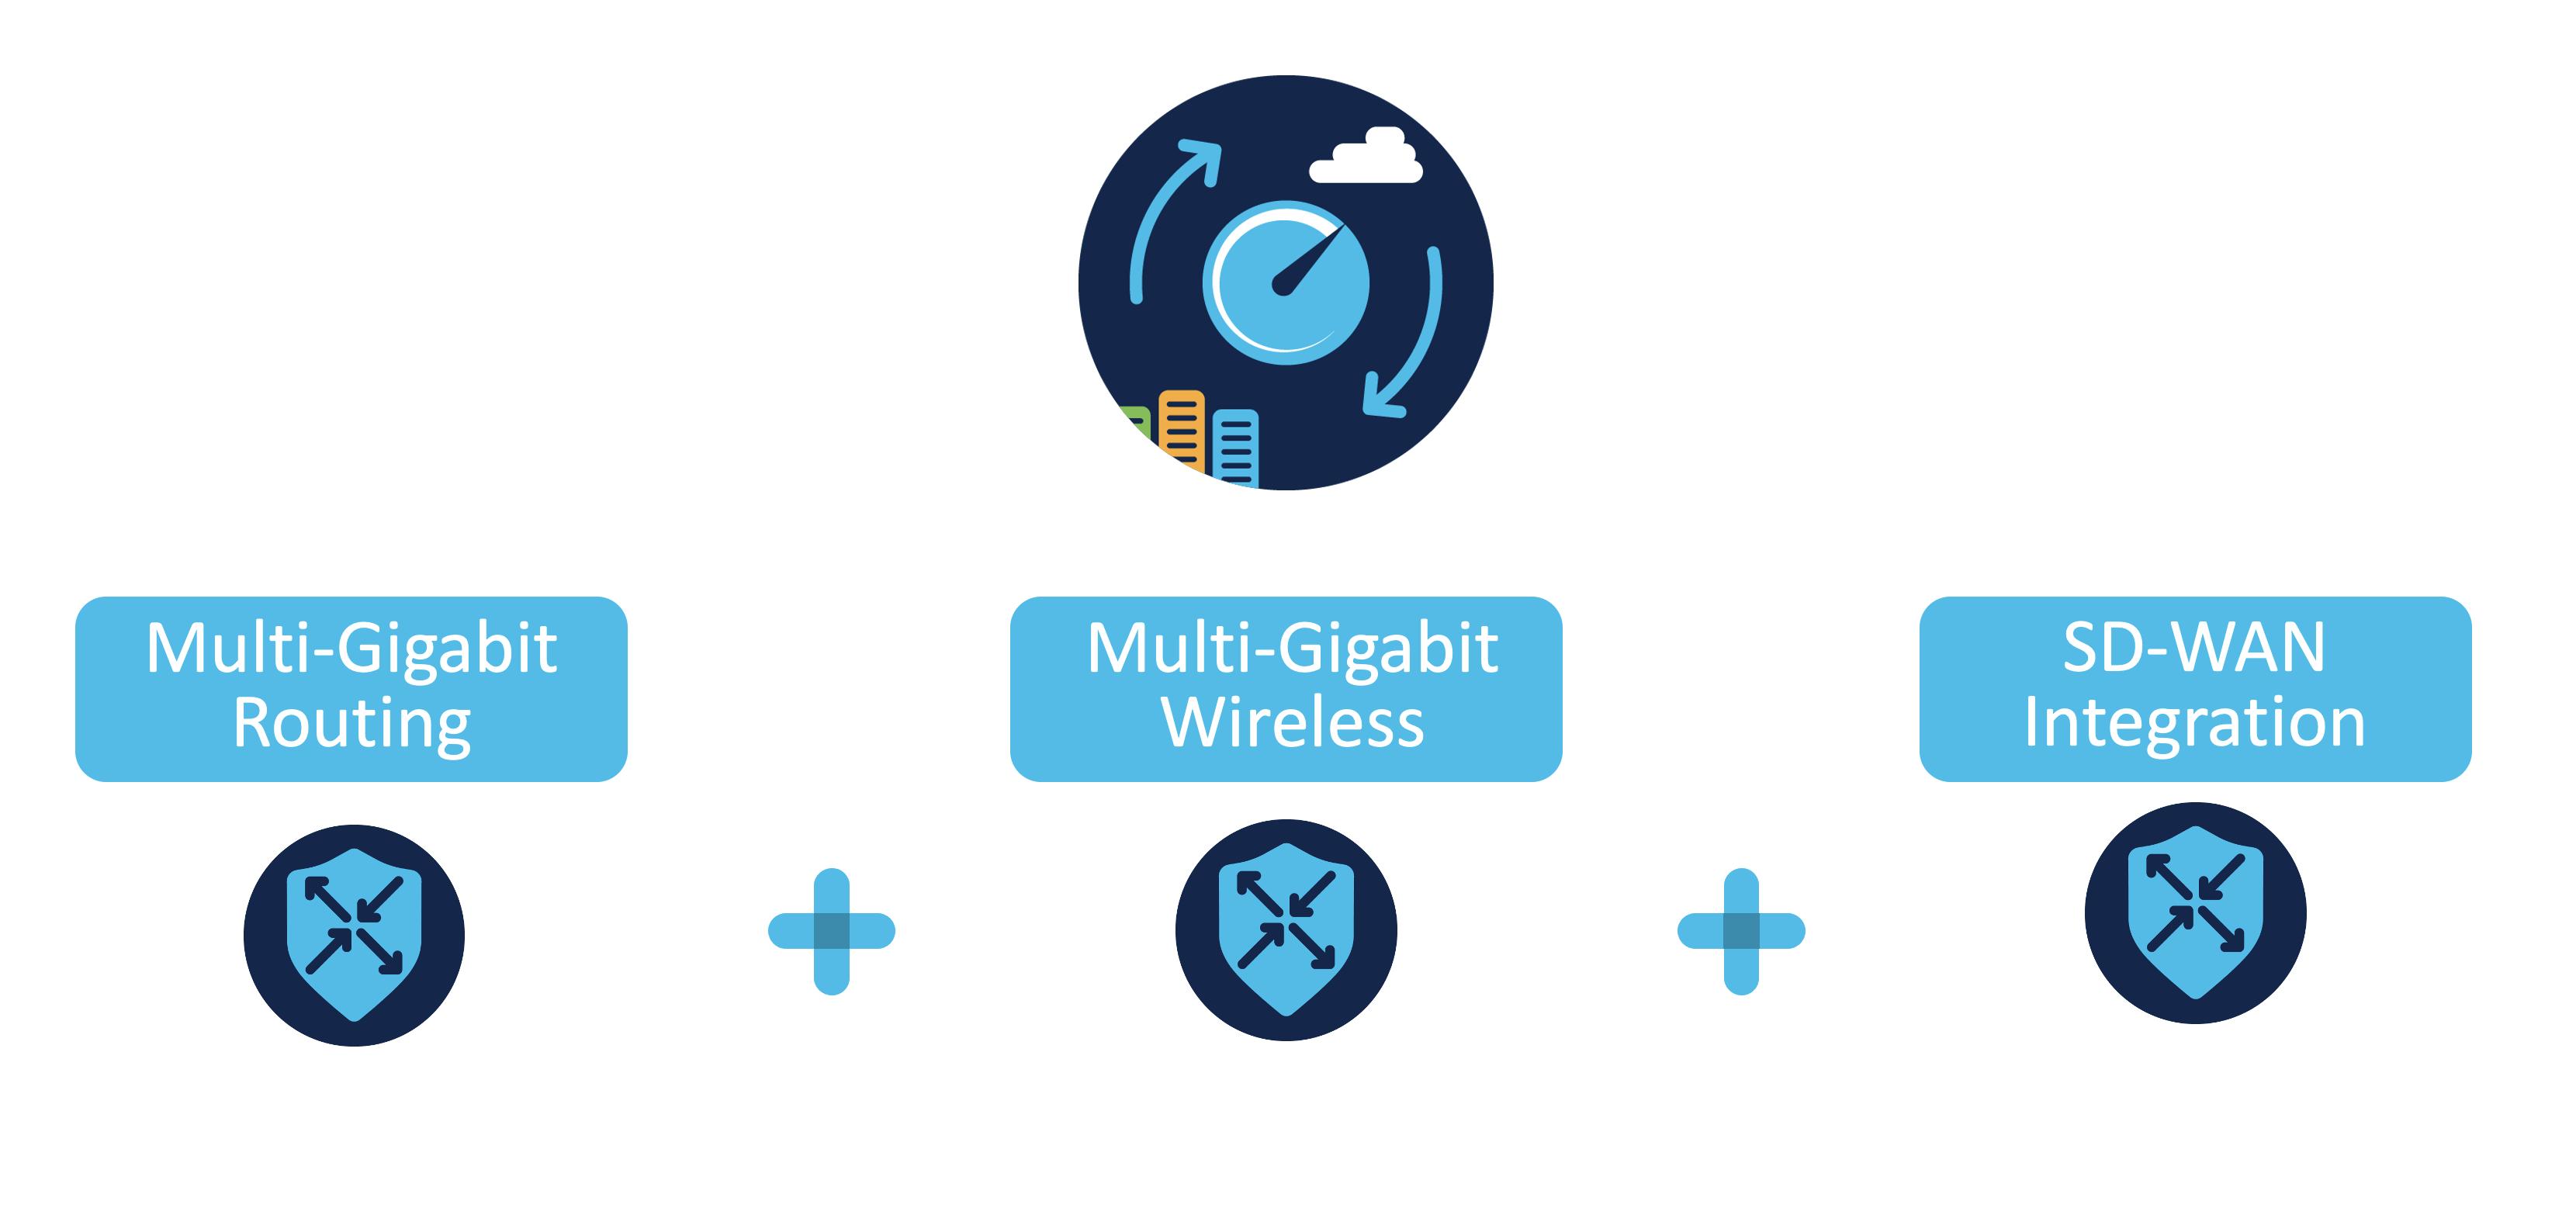 What Makes 5G for Cisco SD-WAN Unique